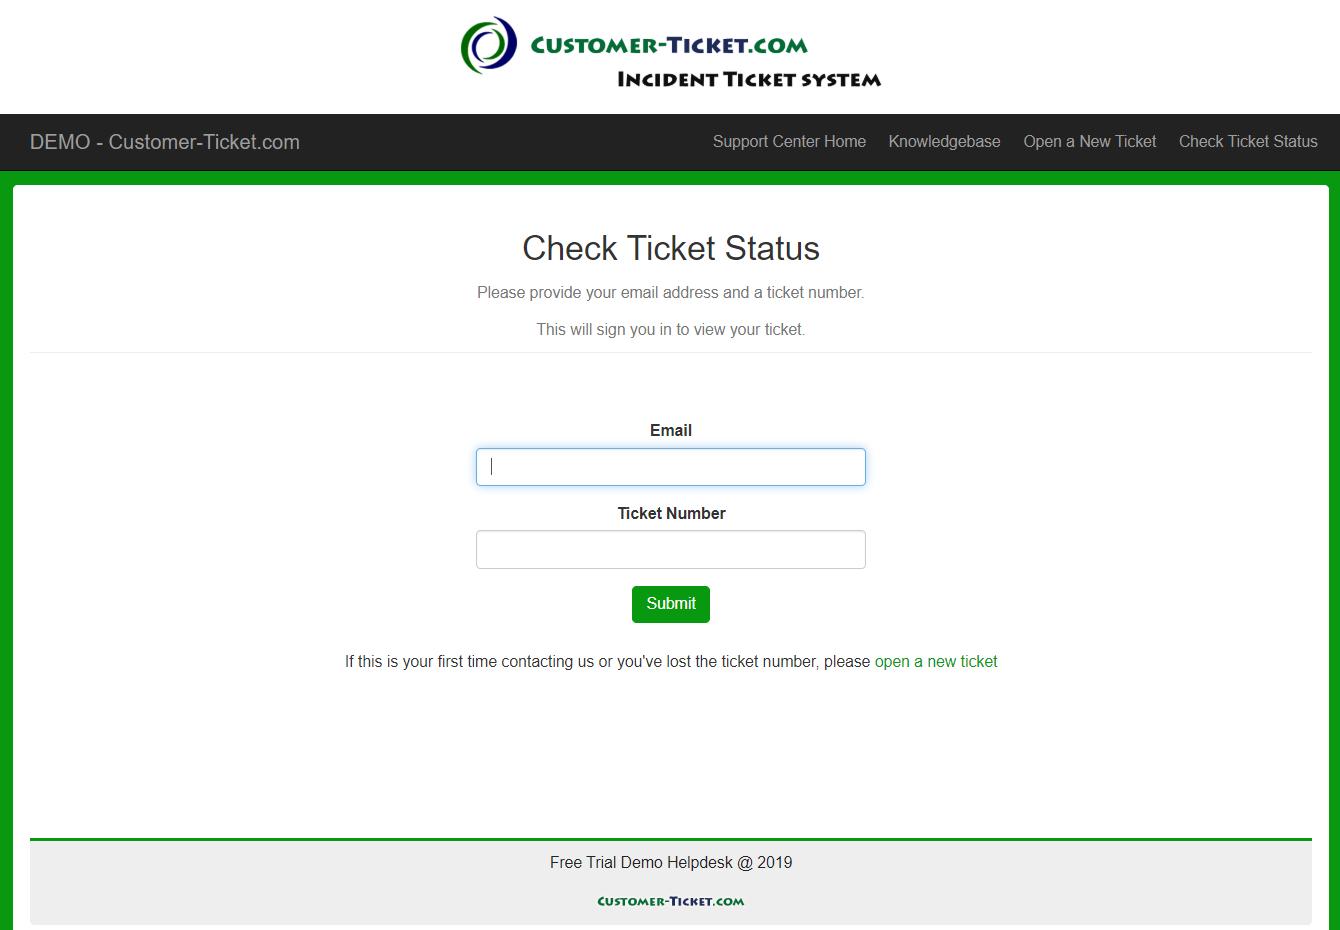 customer-ticket responsive web demo: check ticket status